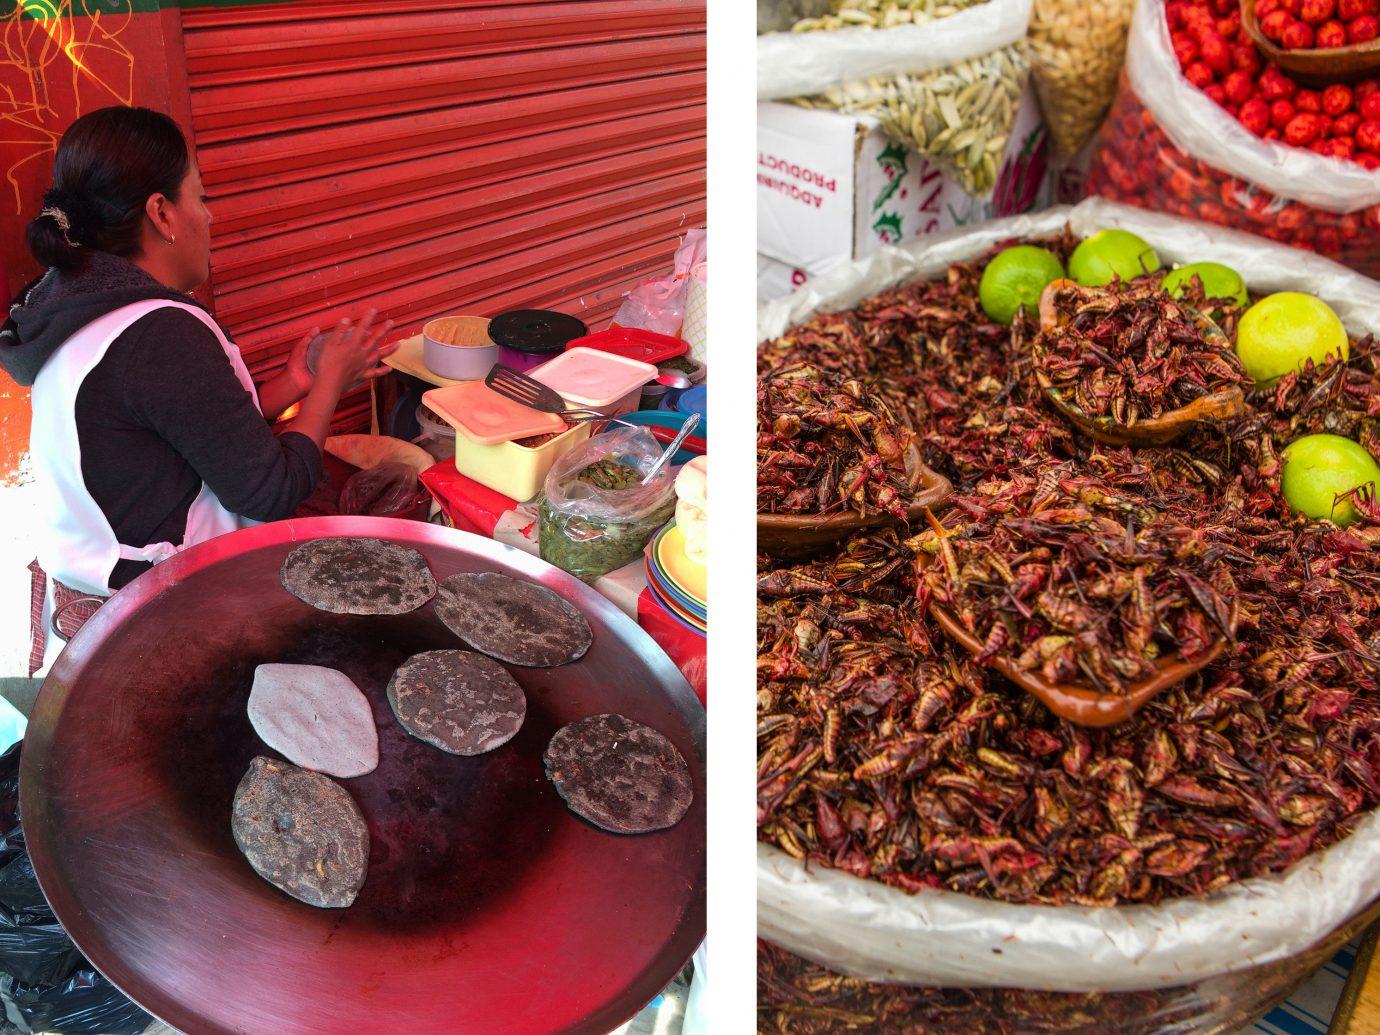 Food + Drink food dish cuisine asian food meat produce street food meal vegetable